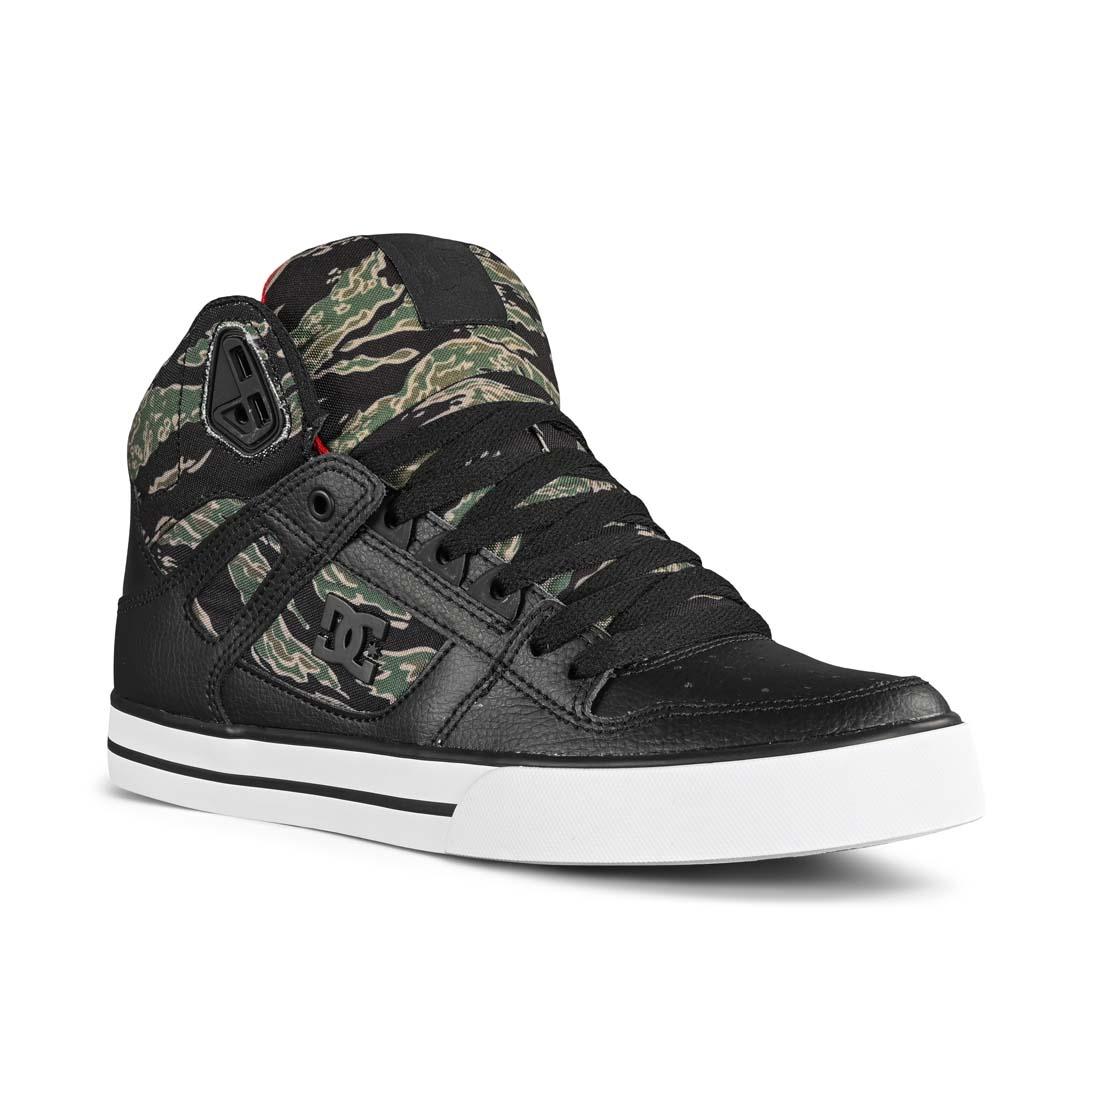 DC Shoes Pure High Top WC SP Camo Print Black